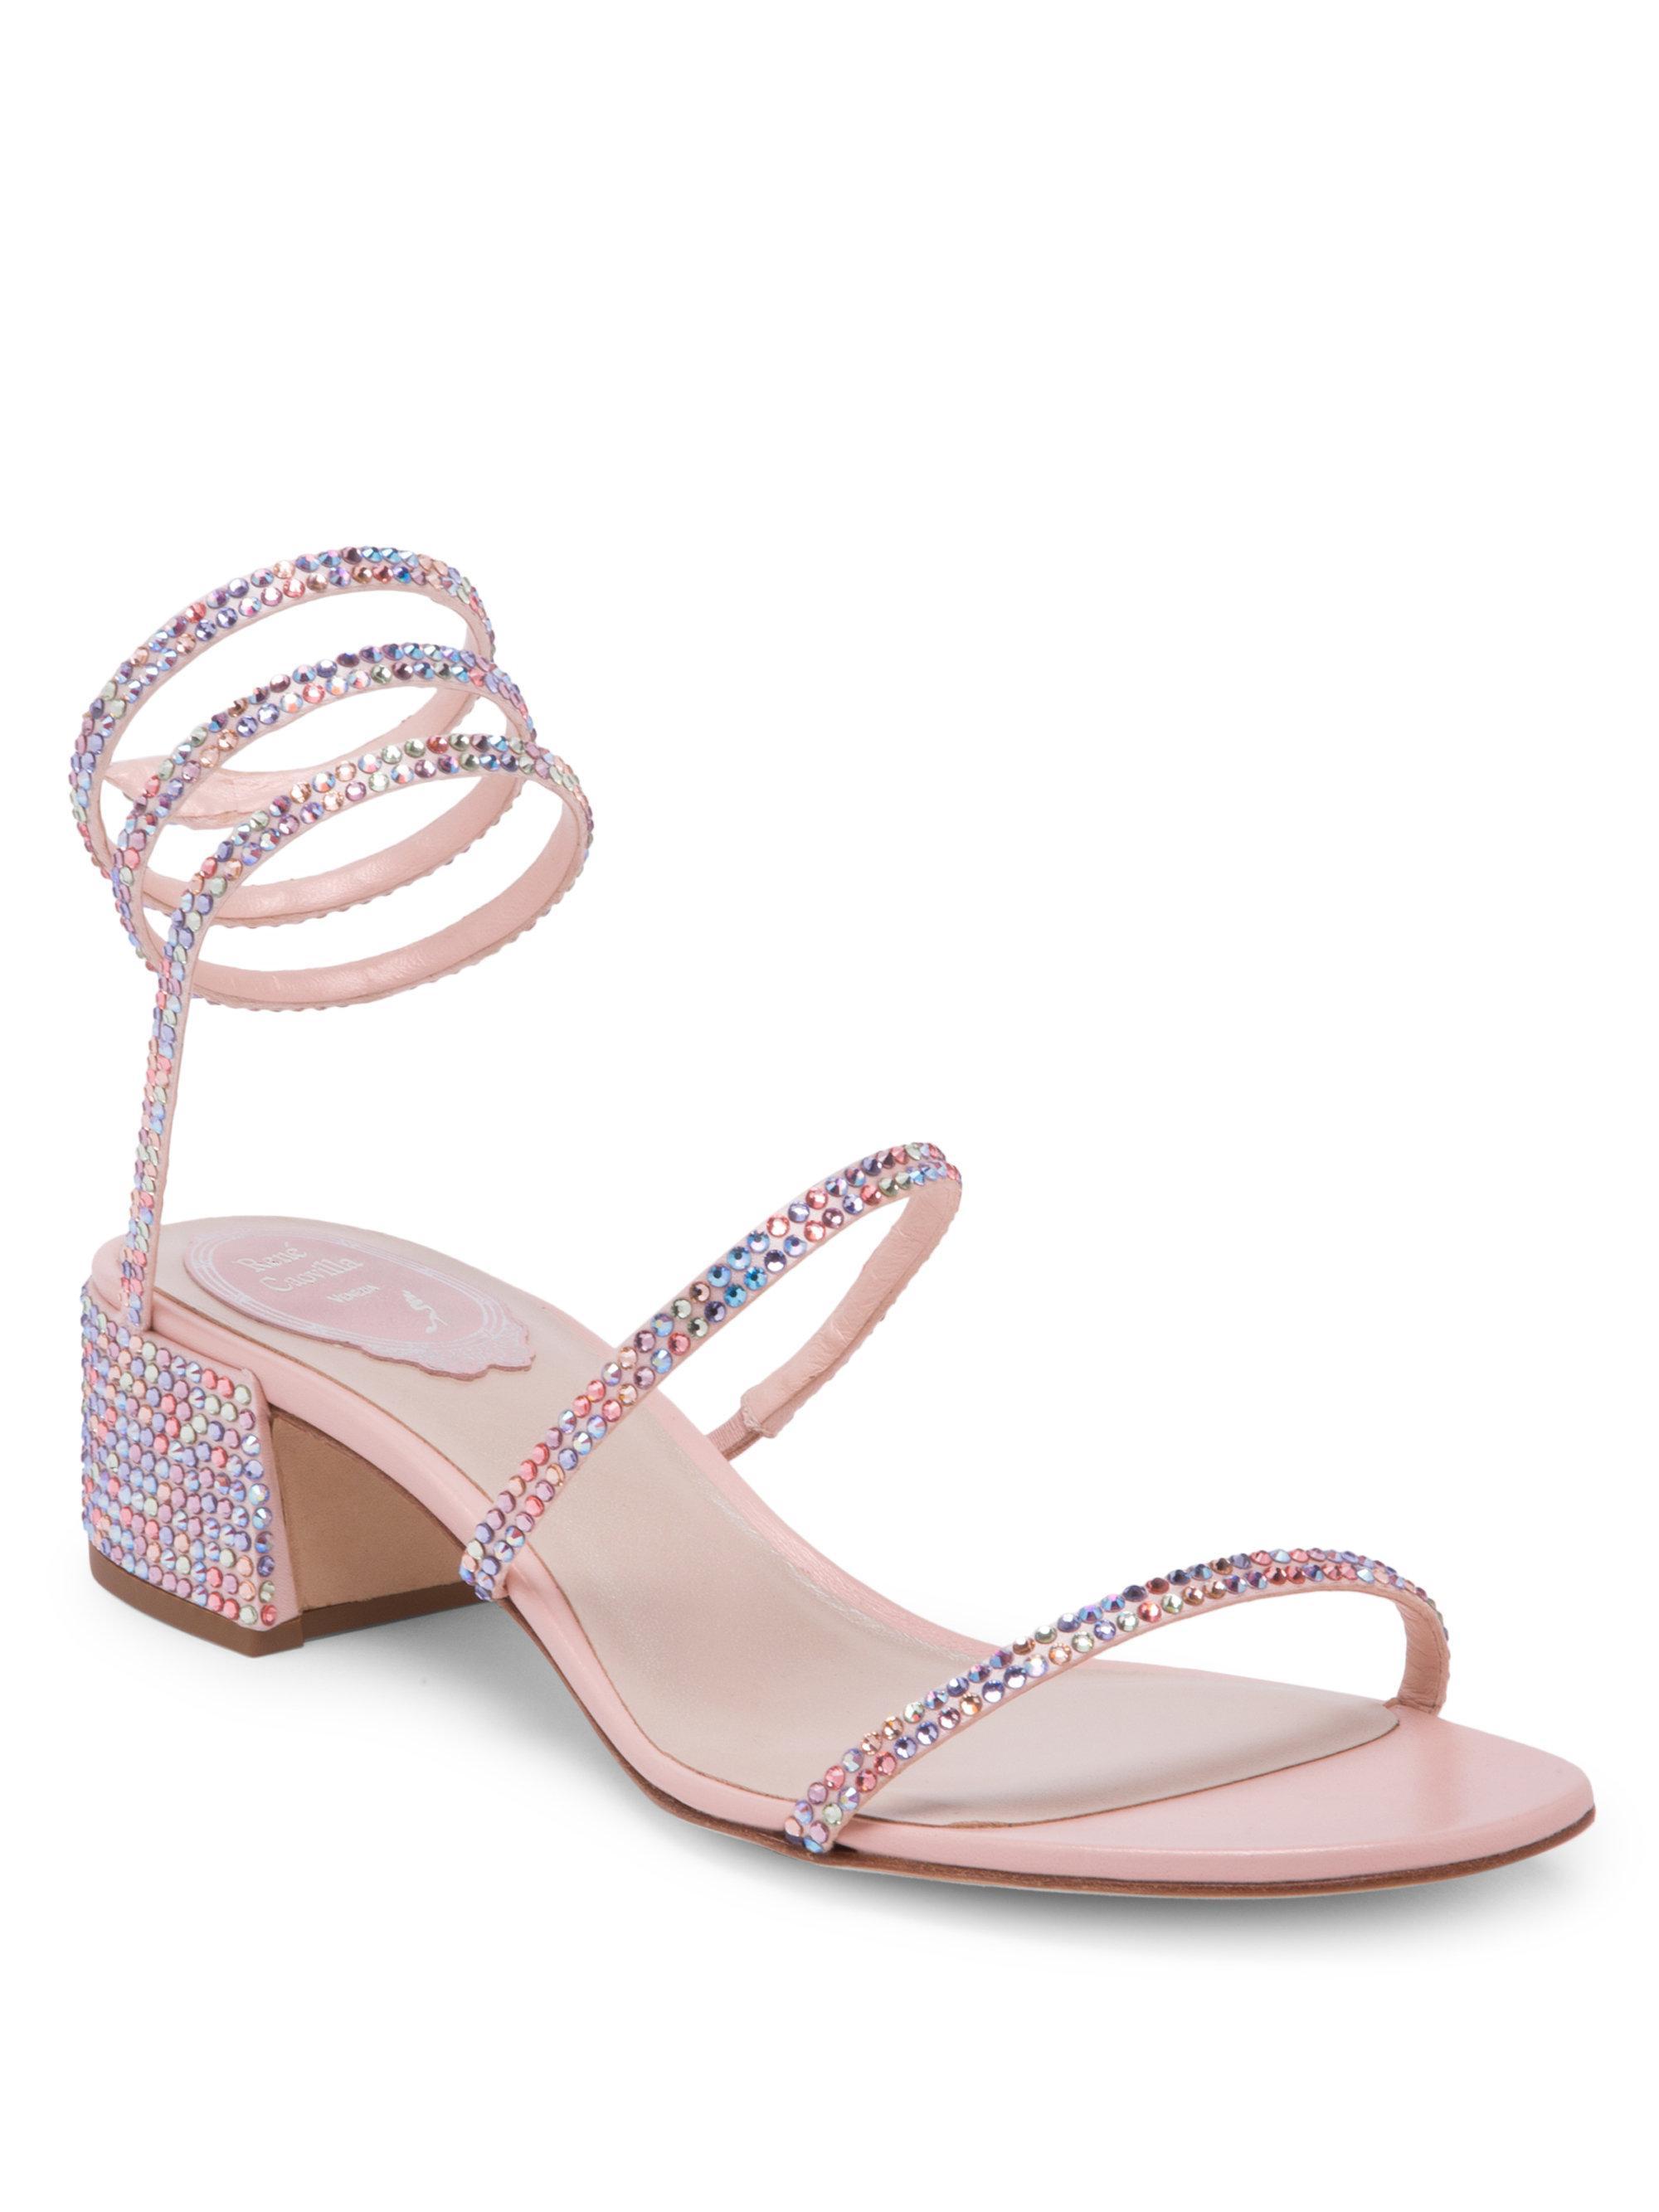 ankle strap sandals - Pink & Purple Rene Caovilla ZaaopPT5